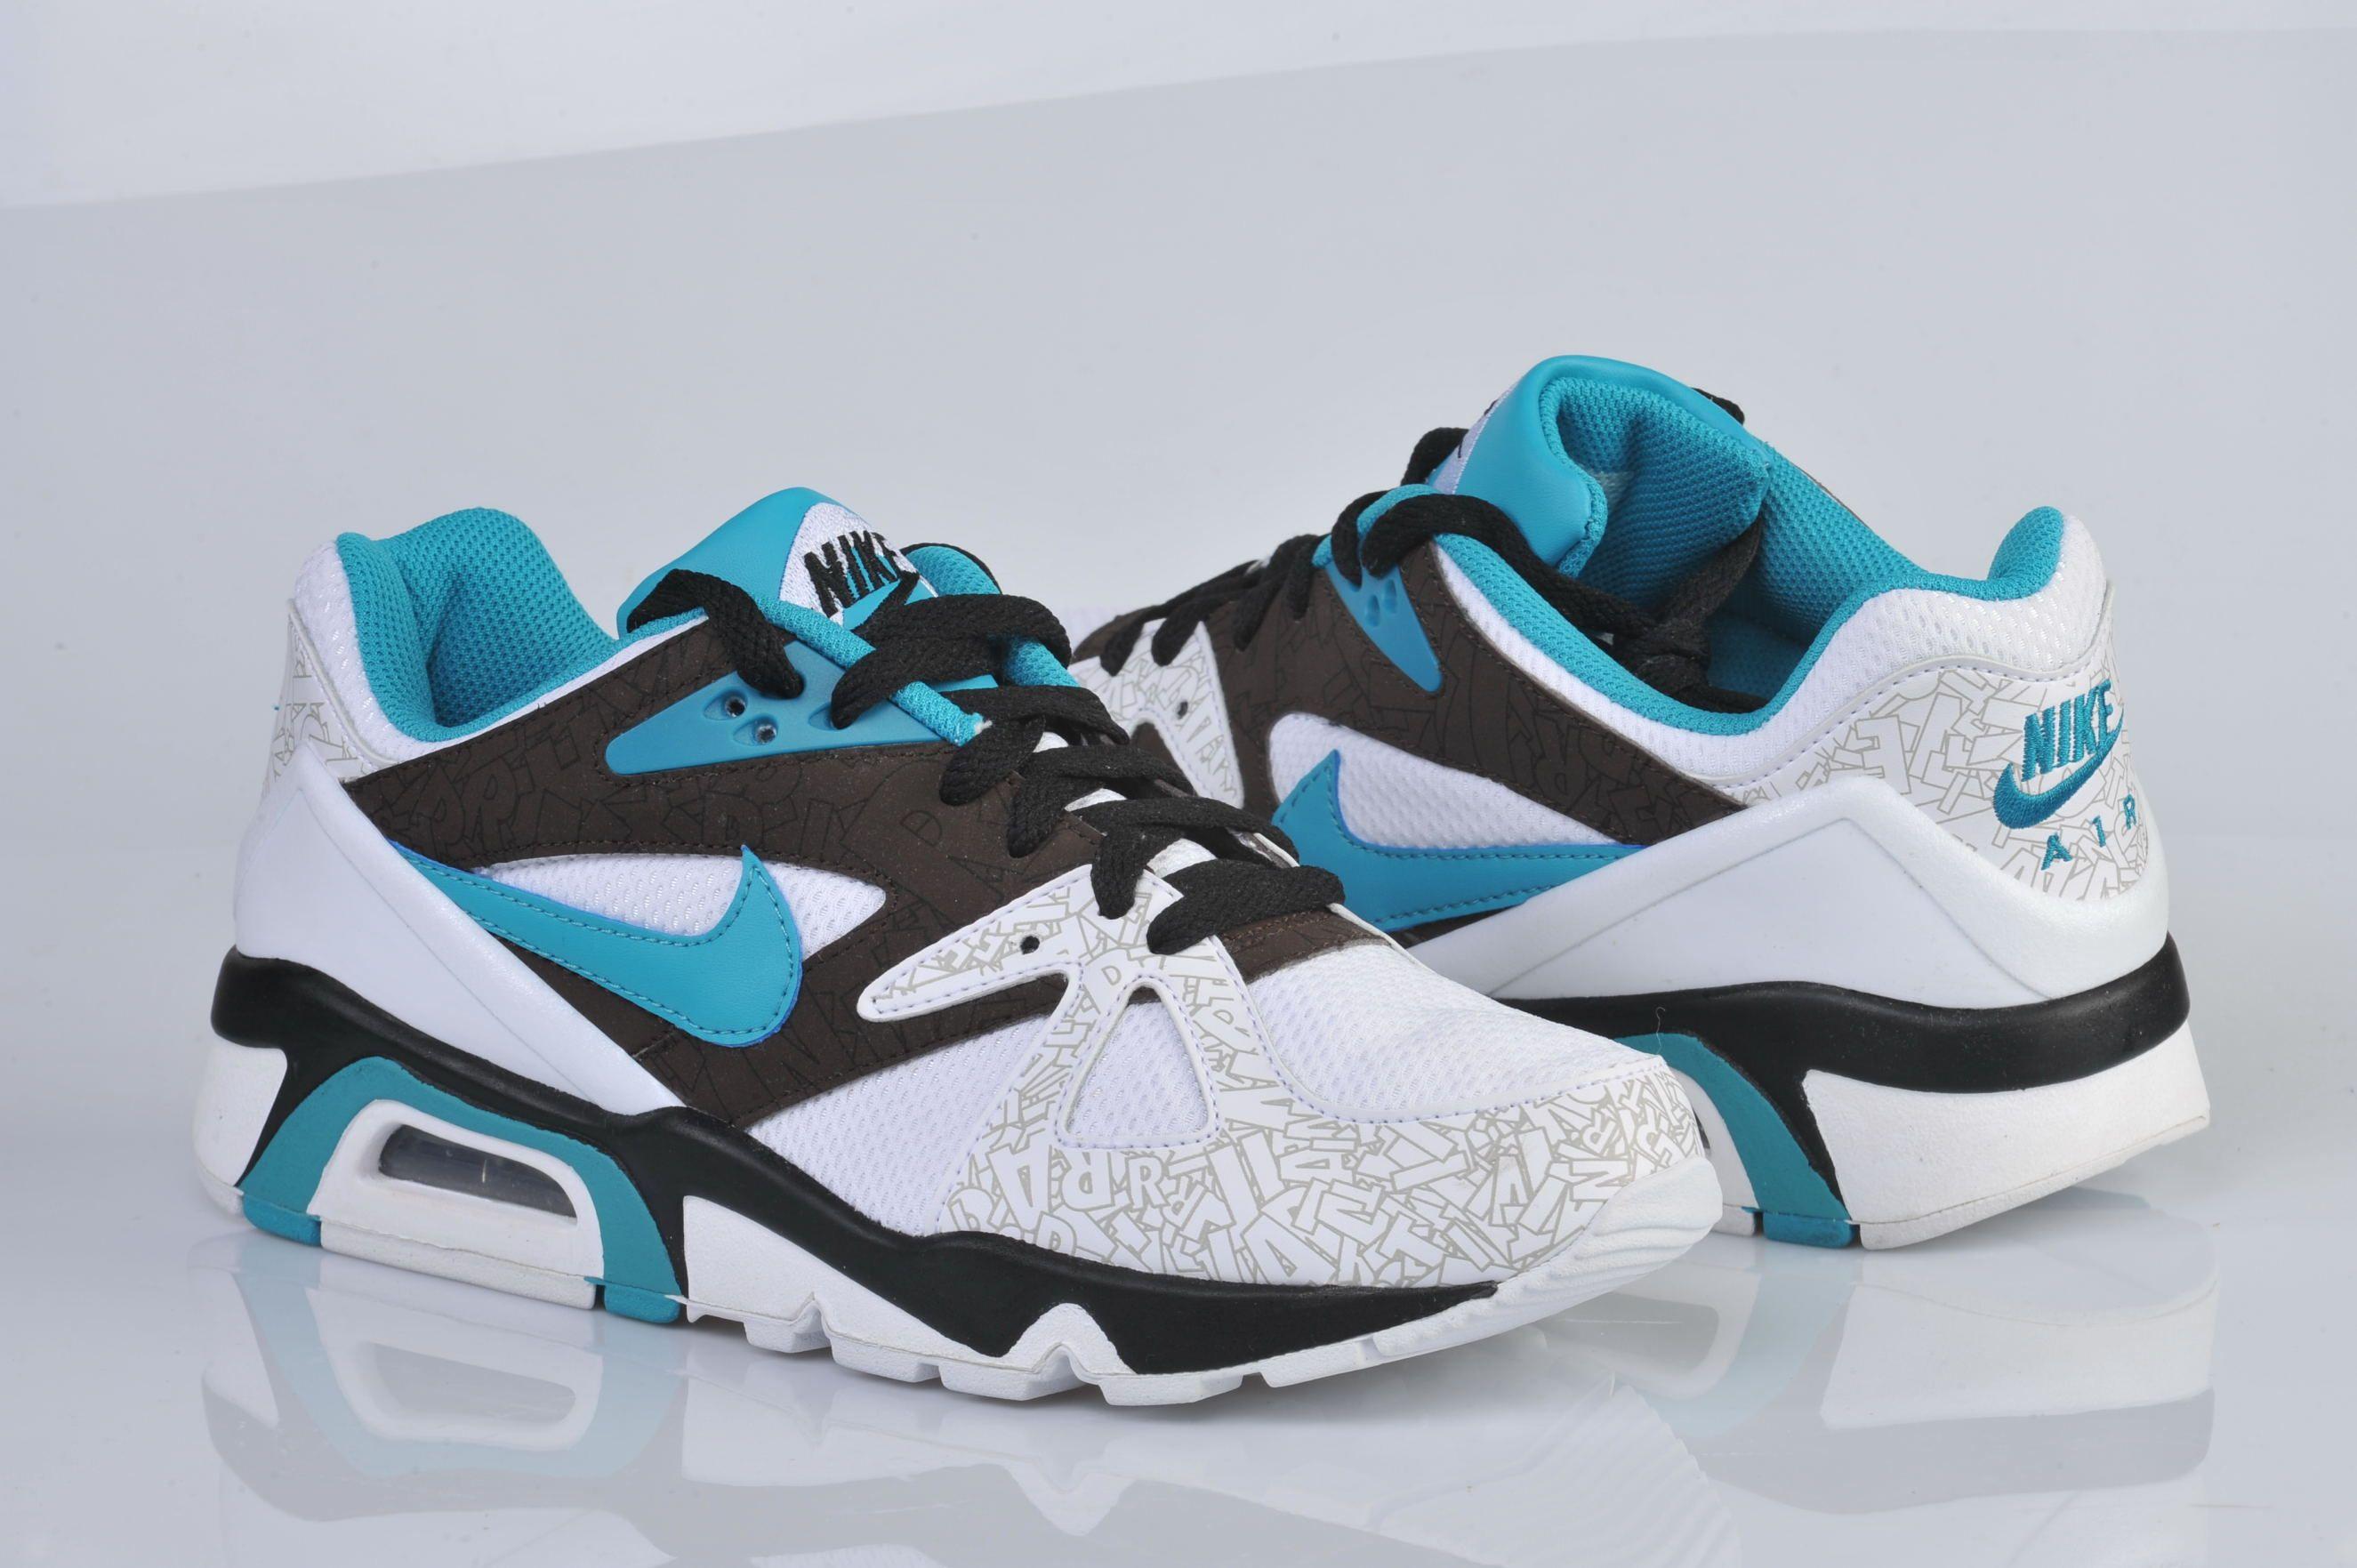 Top qualität herren Nike Air Max Structure Triax 91 Schuhe